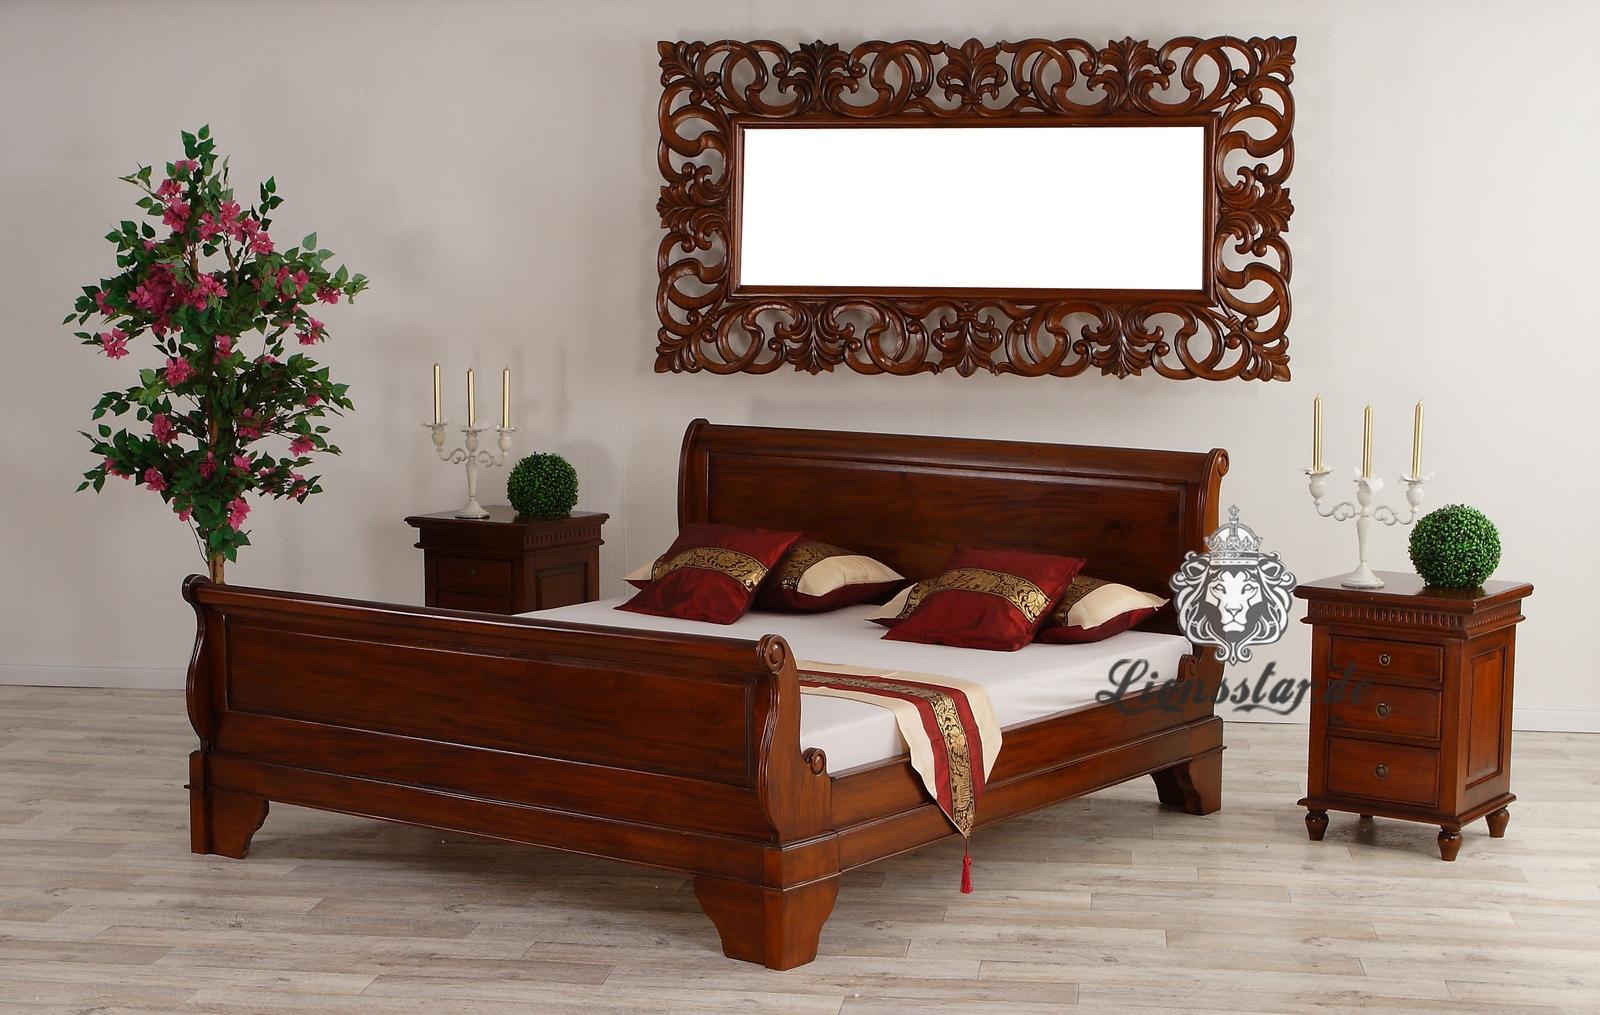 Luxus Empire Bett